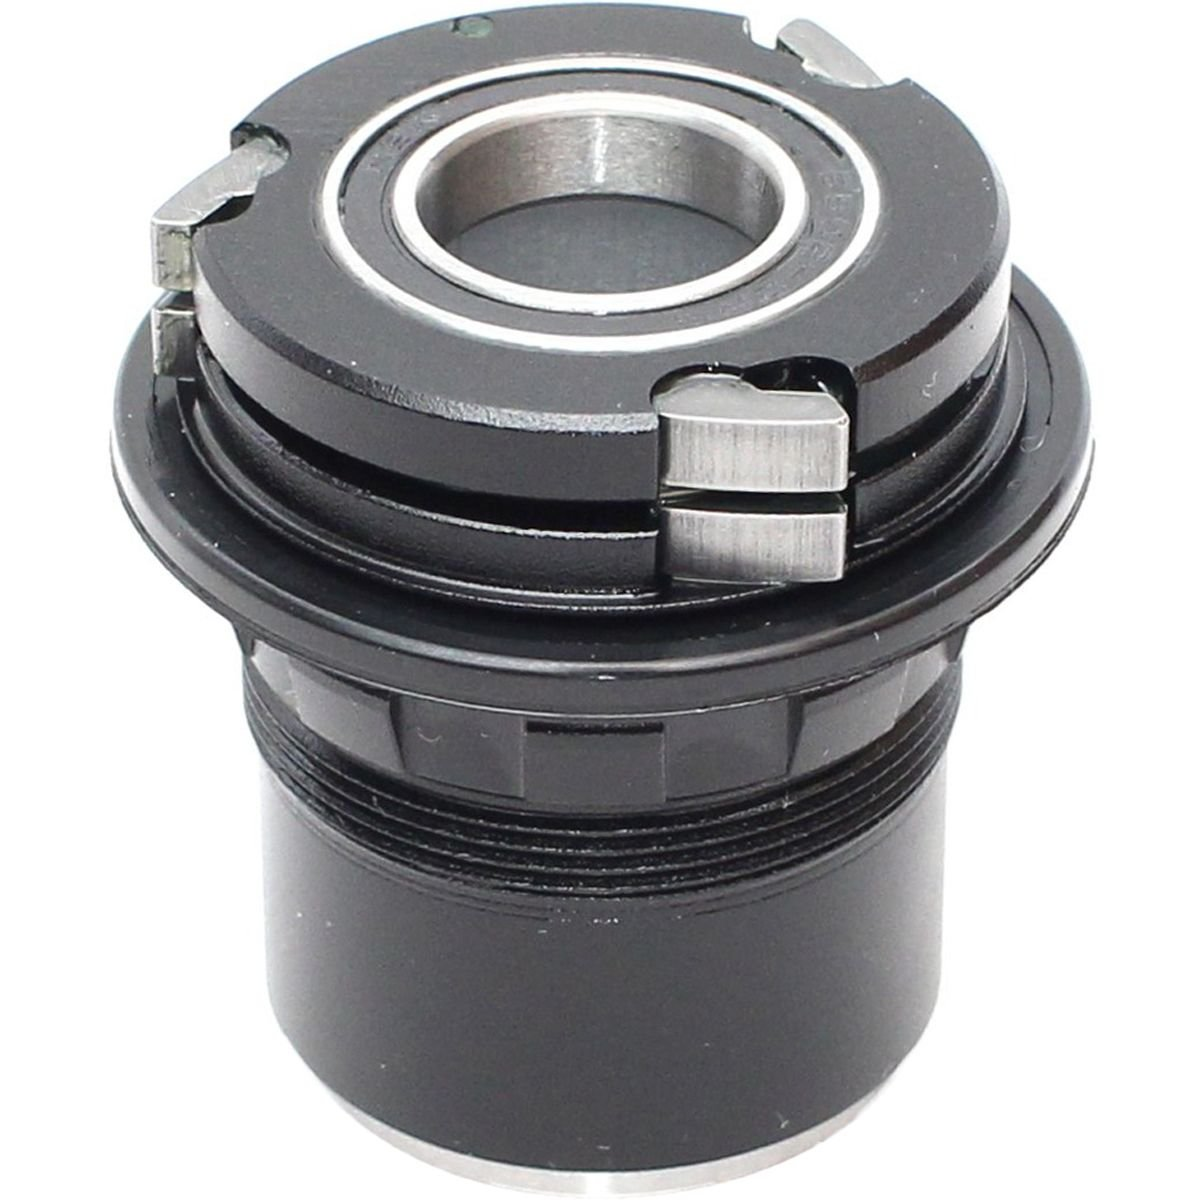 Mercury Wheels フリーハブボディ B07CJXSJ8D HG|Black (3 Pawl) Black (3 Pawl) HG